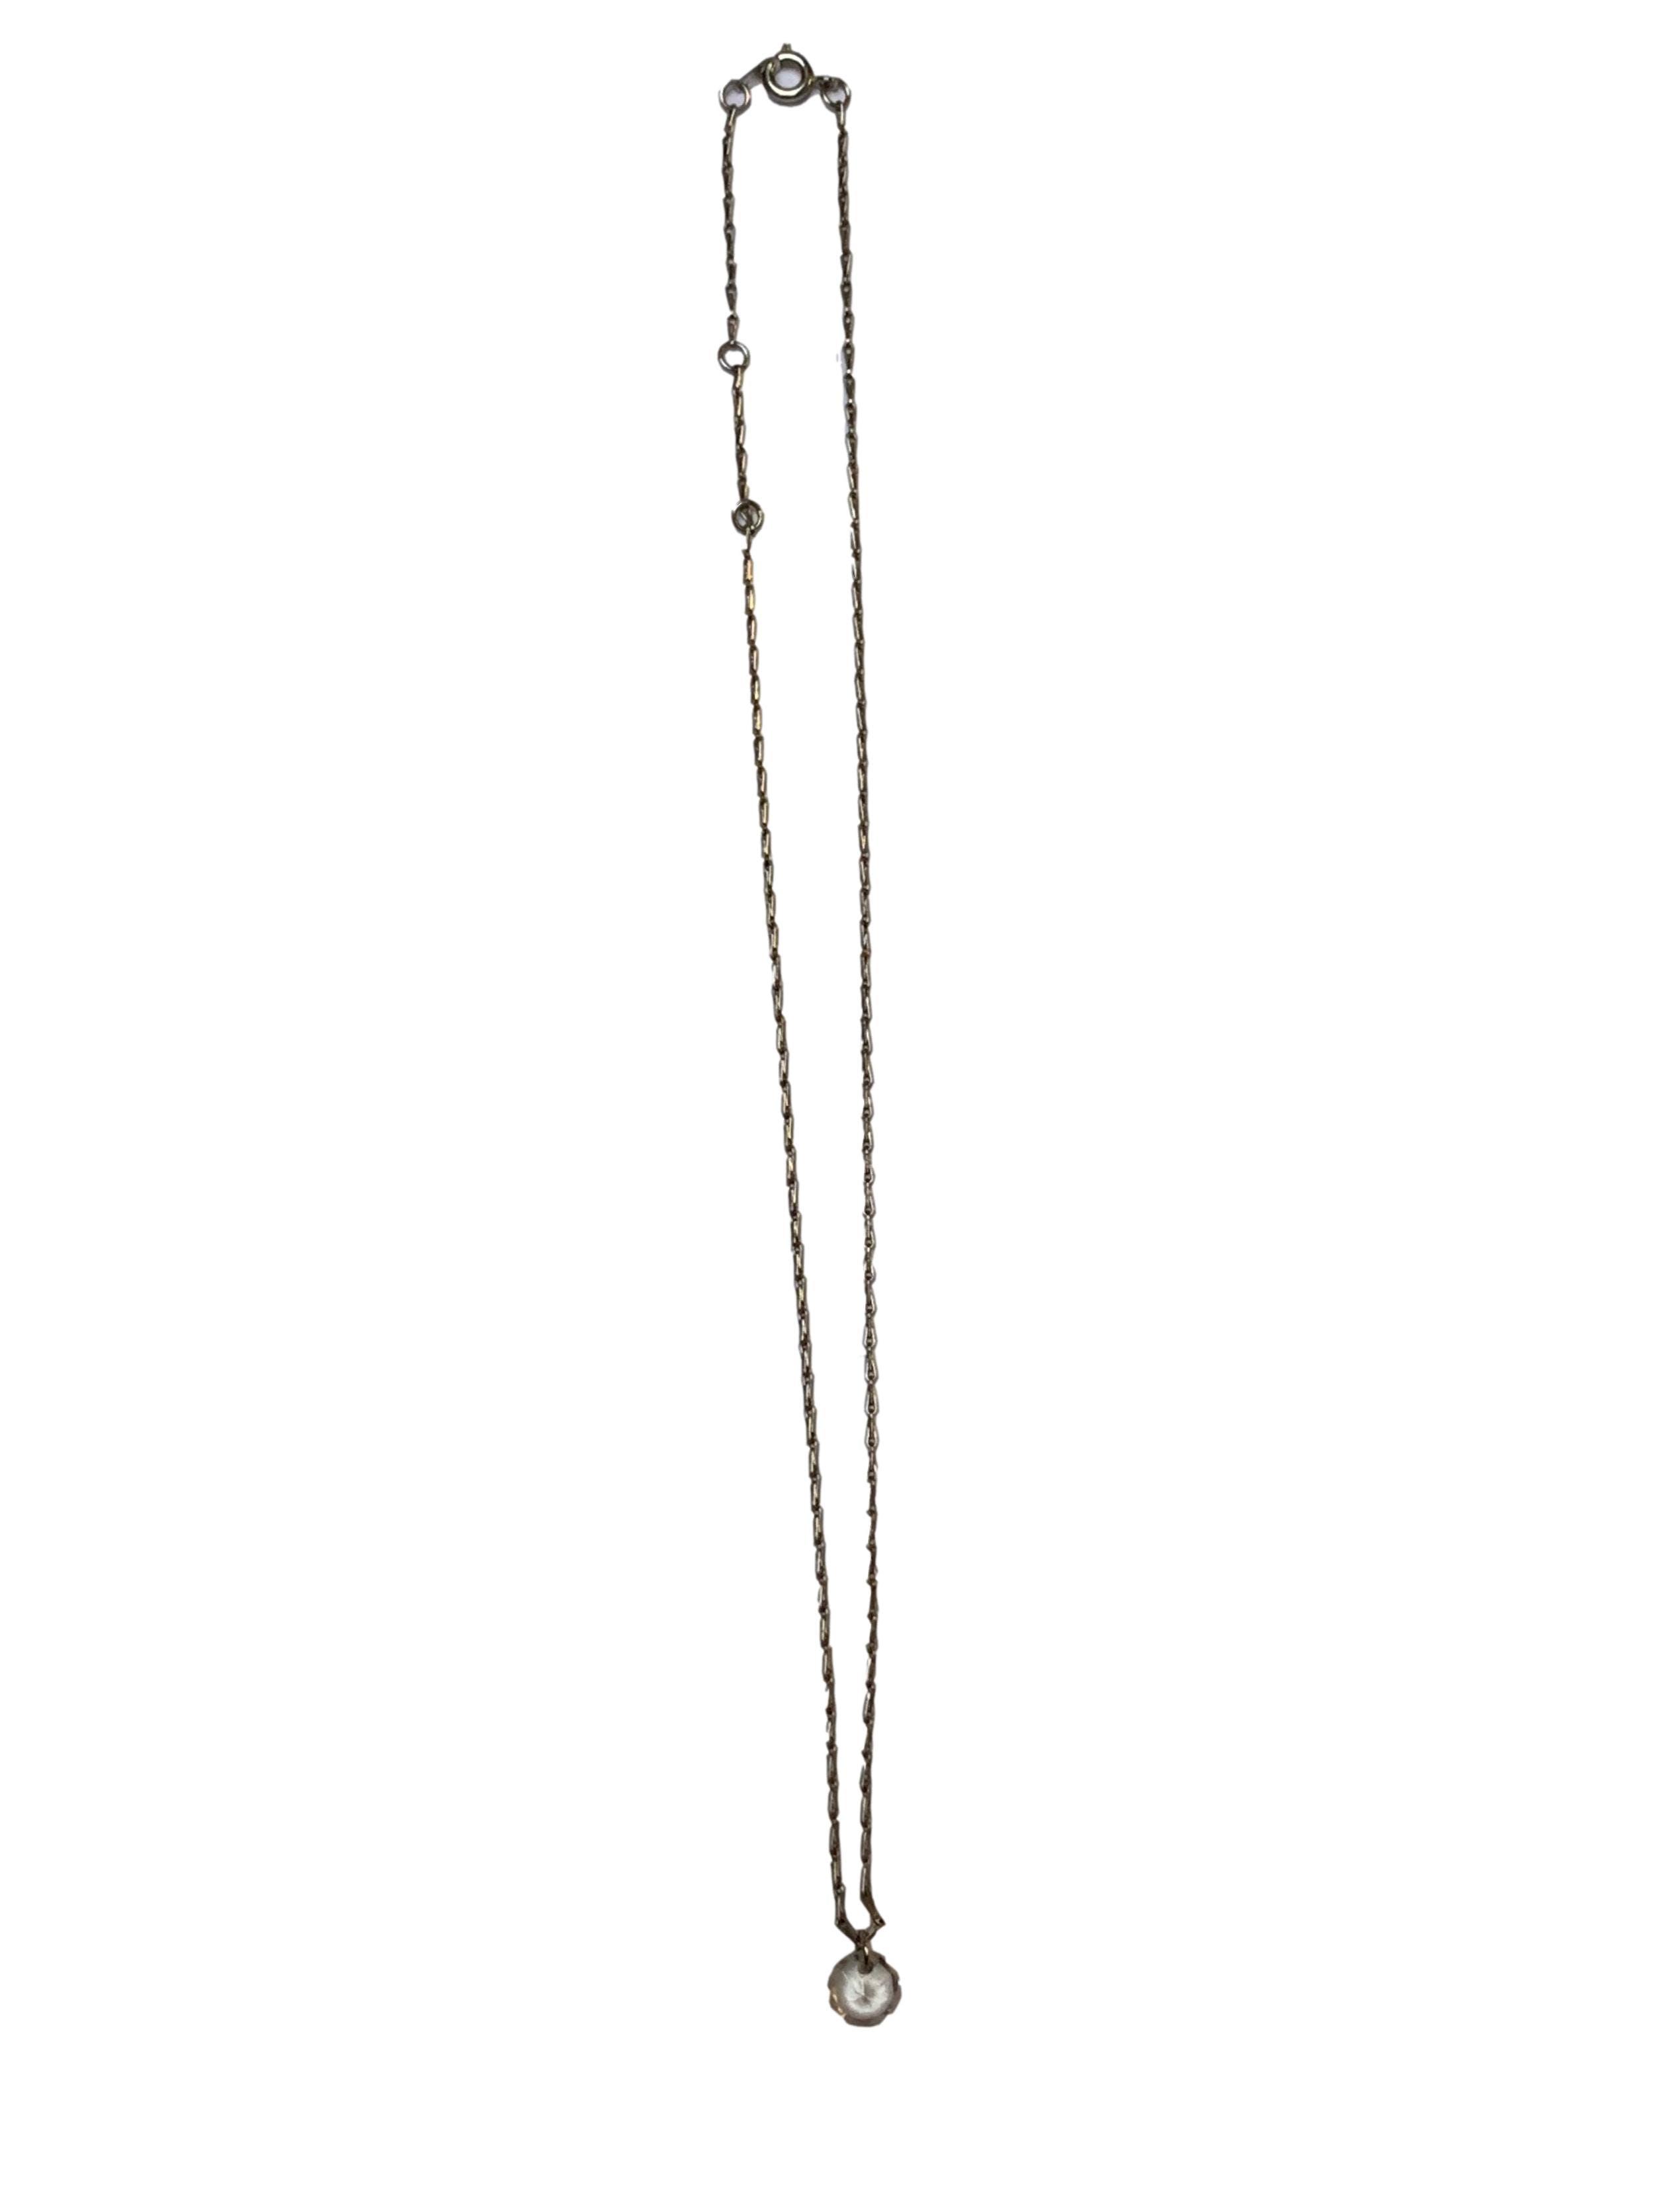 Collar cadenita plateada con dije diamante. Largo 44cm